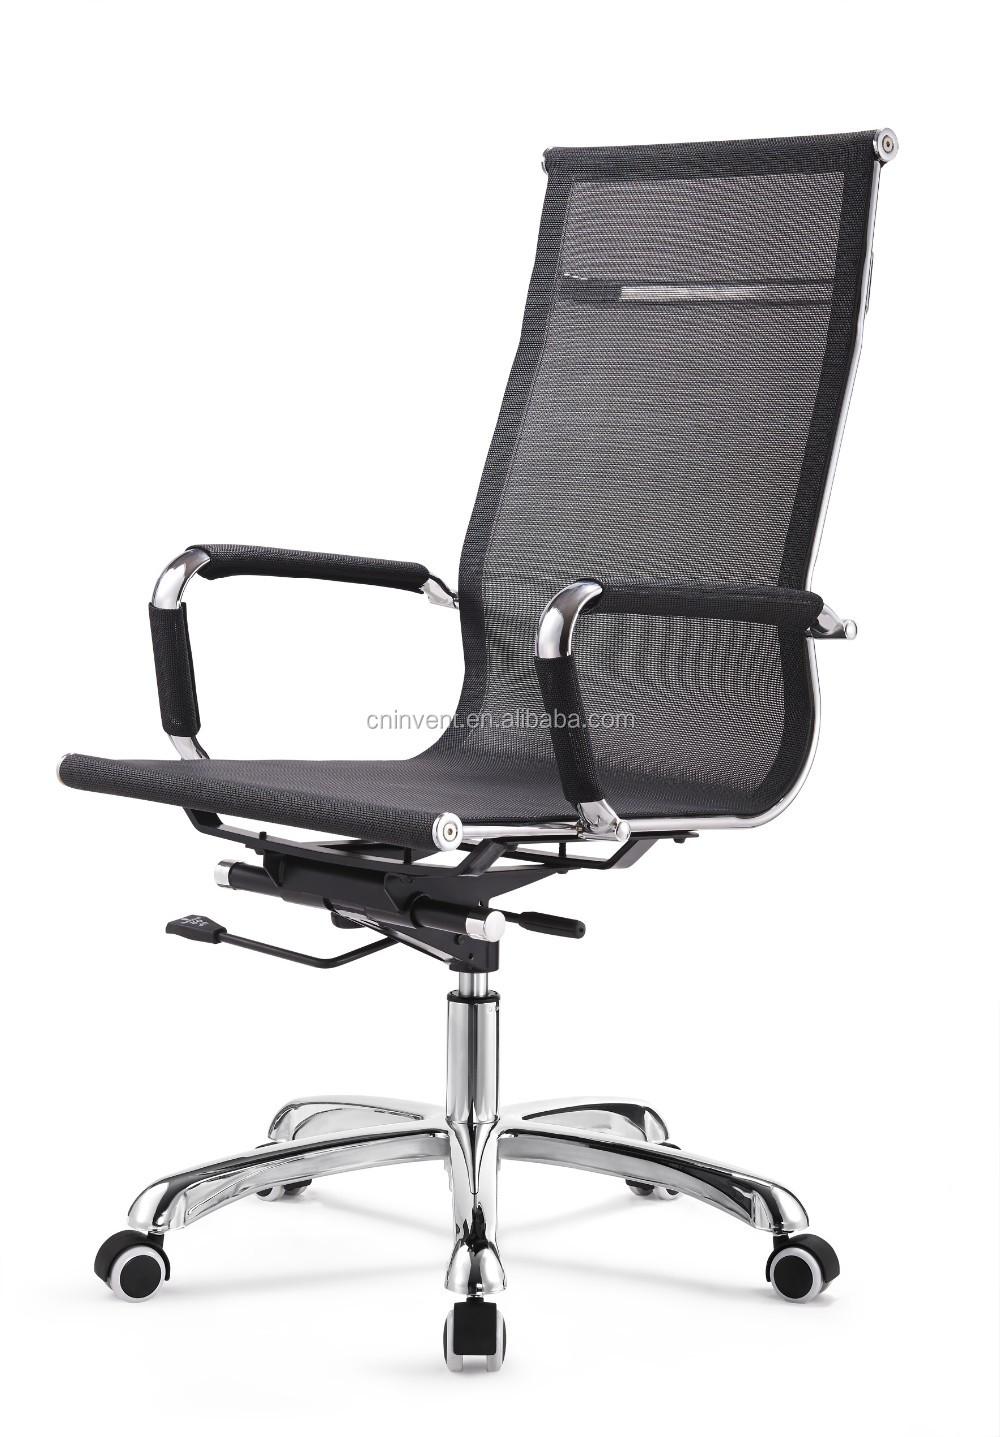 Low Price Aluminum Alloy Office Mesh Chair - Buy Full Mesh Office